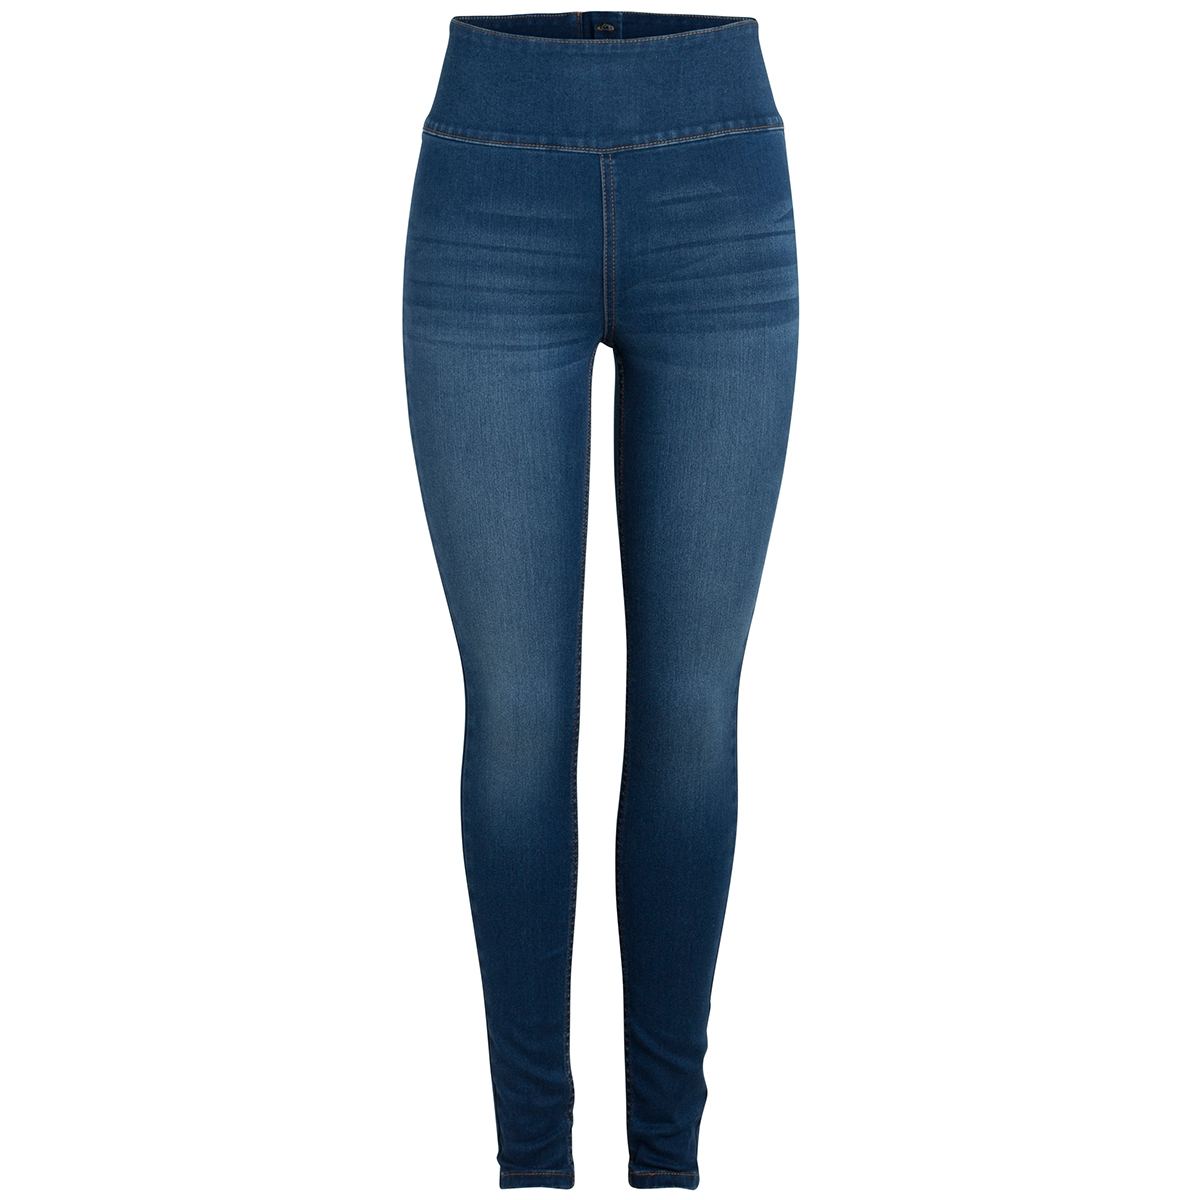 pchighwaist betty jeggings mbld w2 17081325 pieces legging medium blue denim